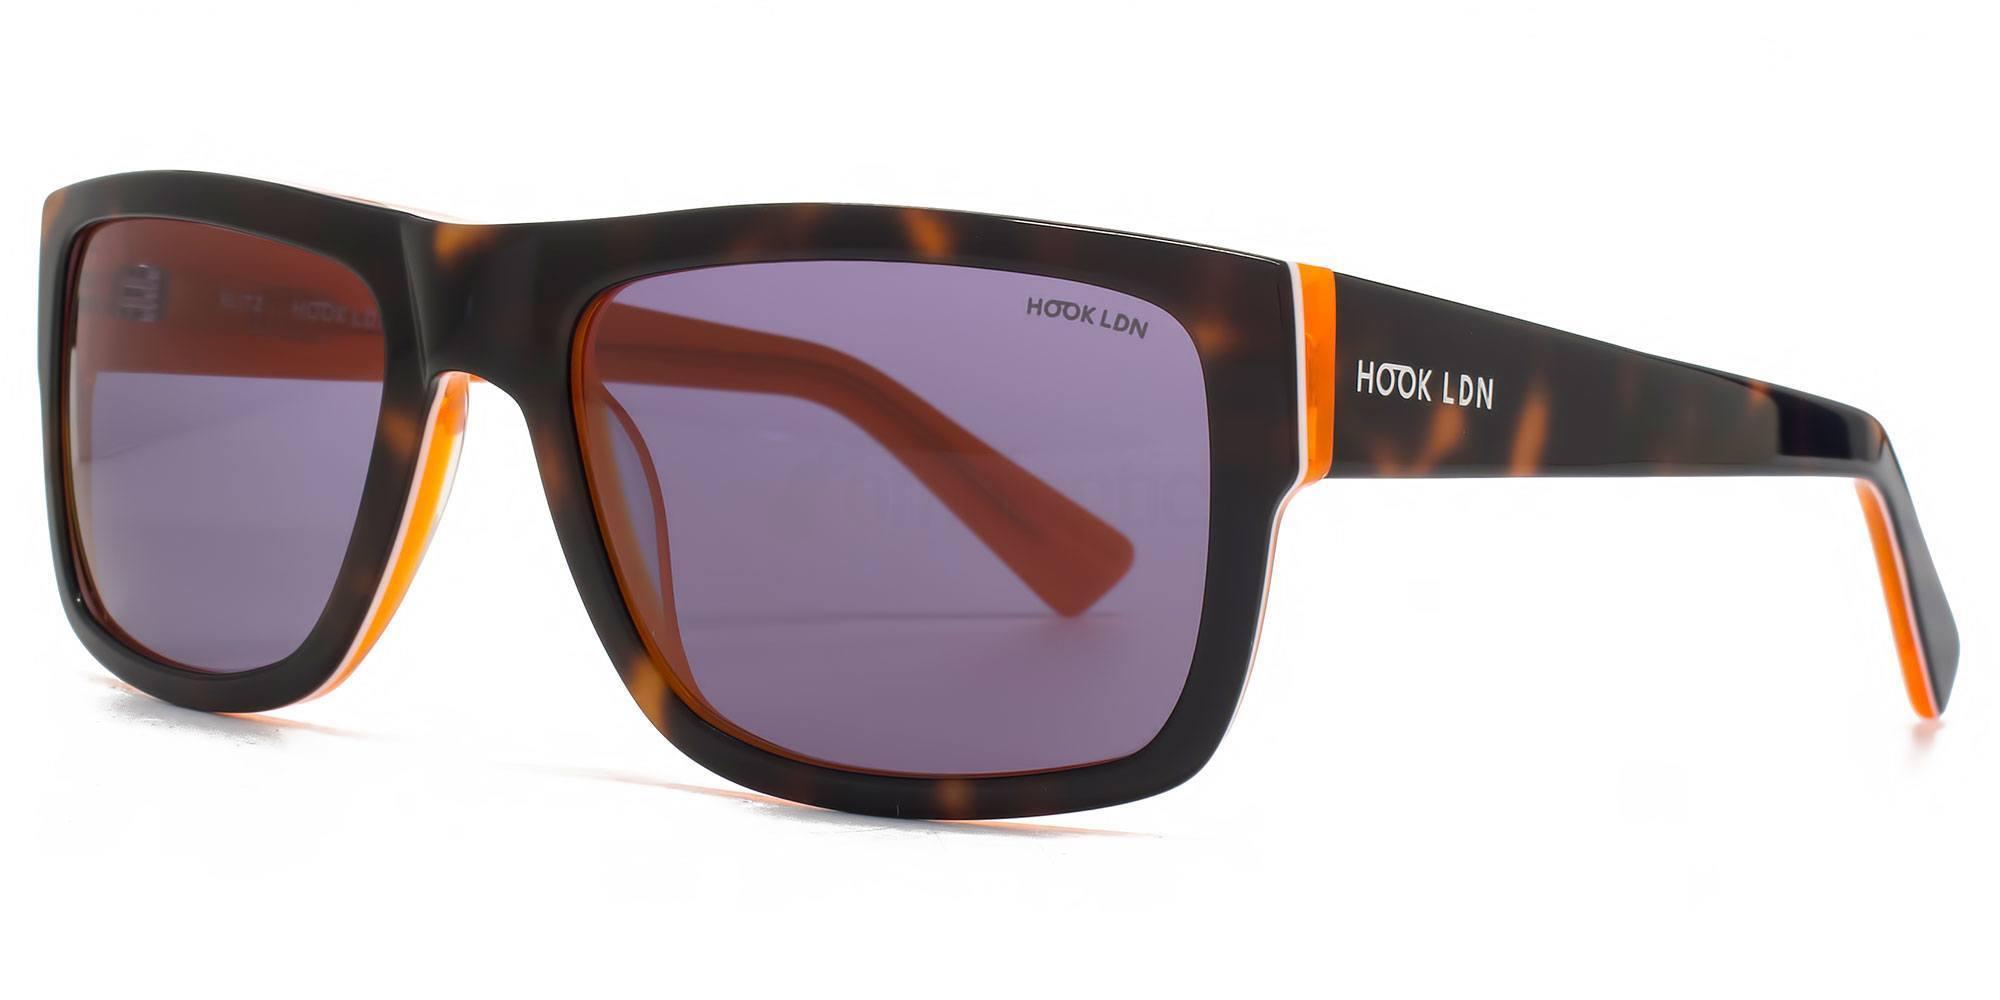 ORG HK003 - BLITZ , Hook LDN